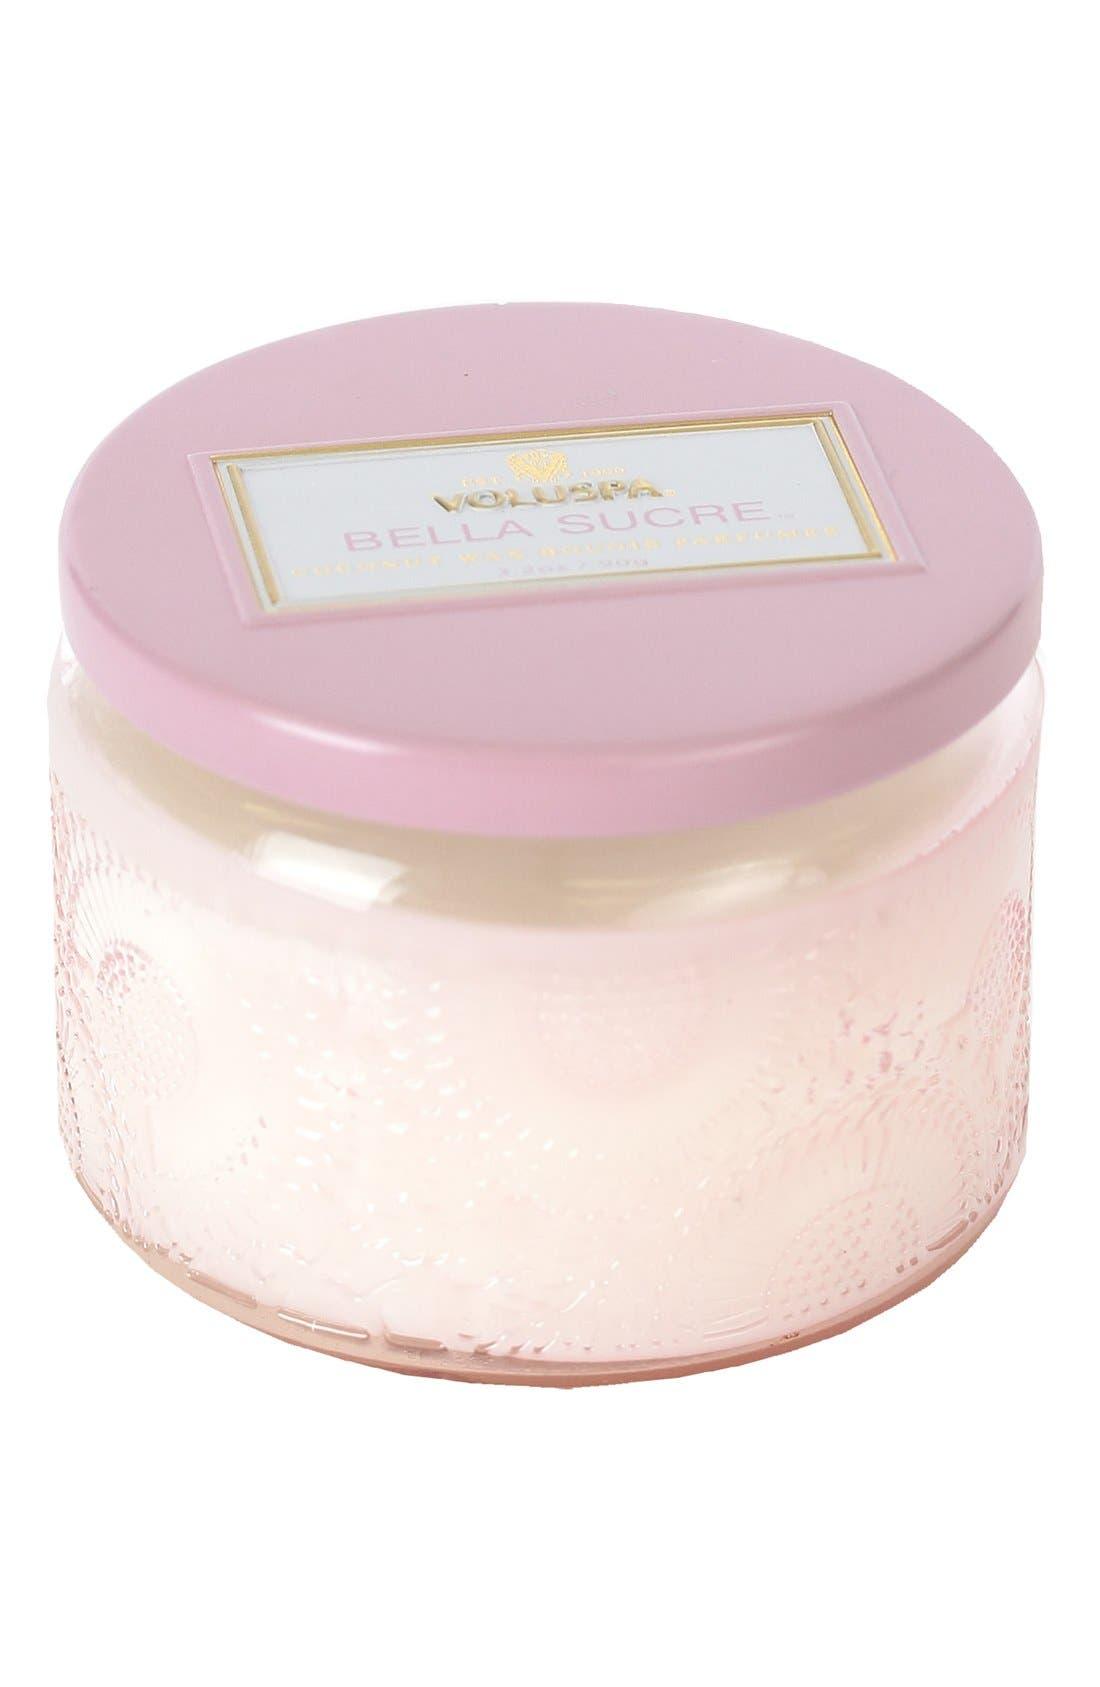 Main Image - Voluspa 'Japonica - Bella Sucre' Petite Colored Jar Candle